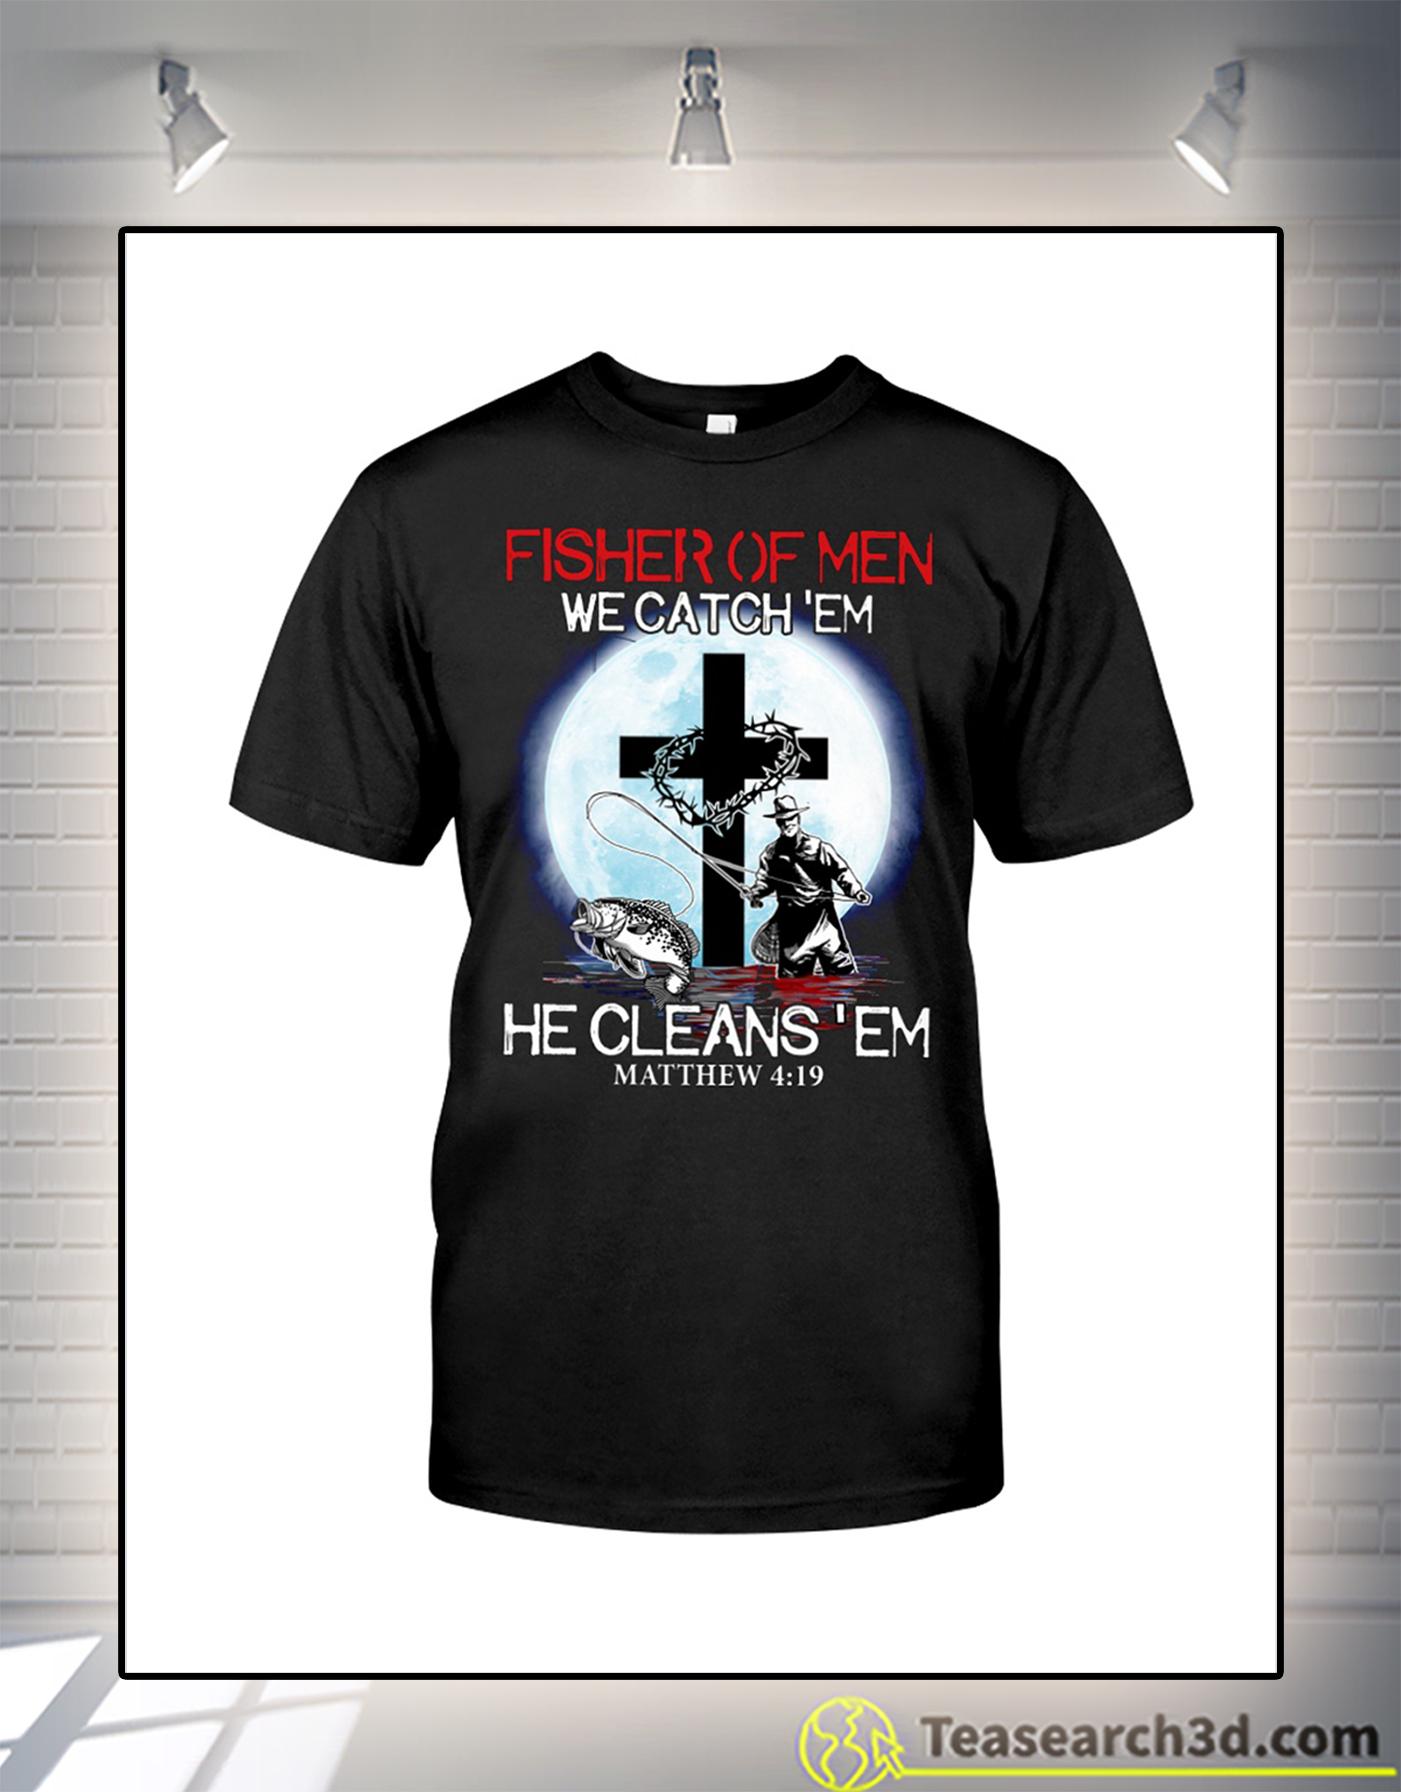 Fisher of men we catch 'em he cleans 'em matthew 4 19 t-shirt